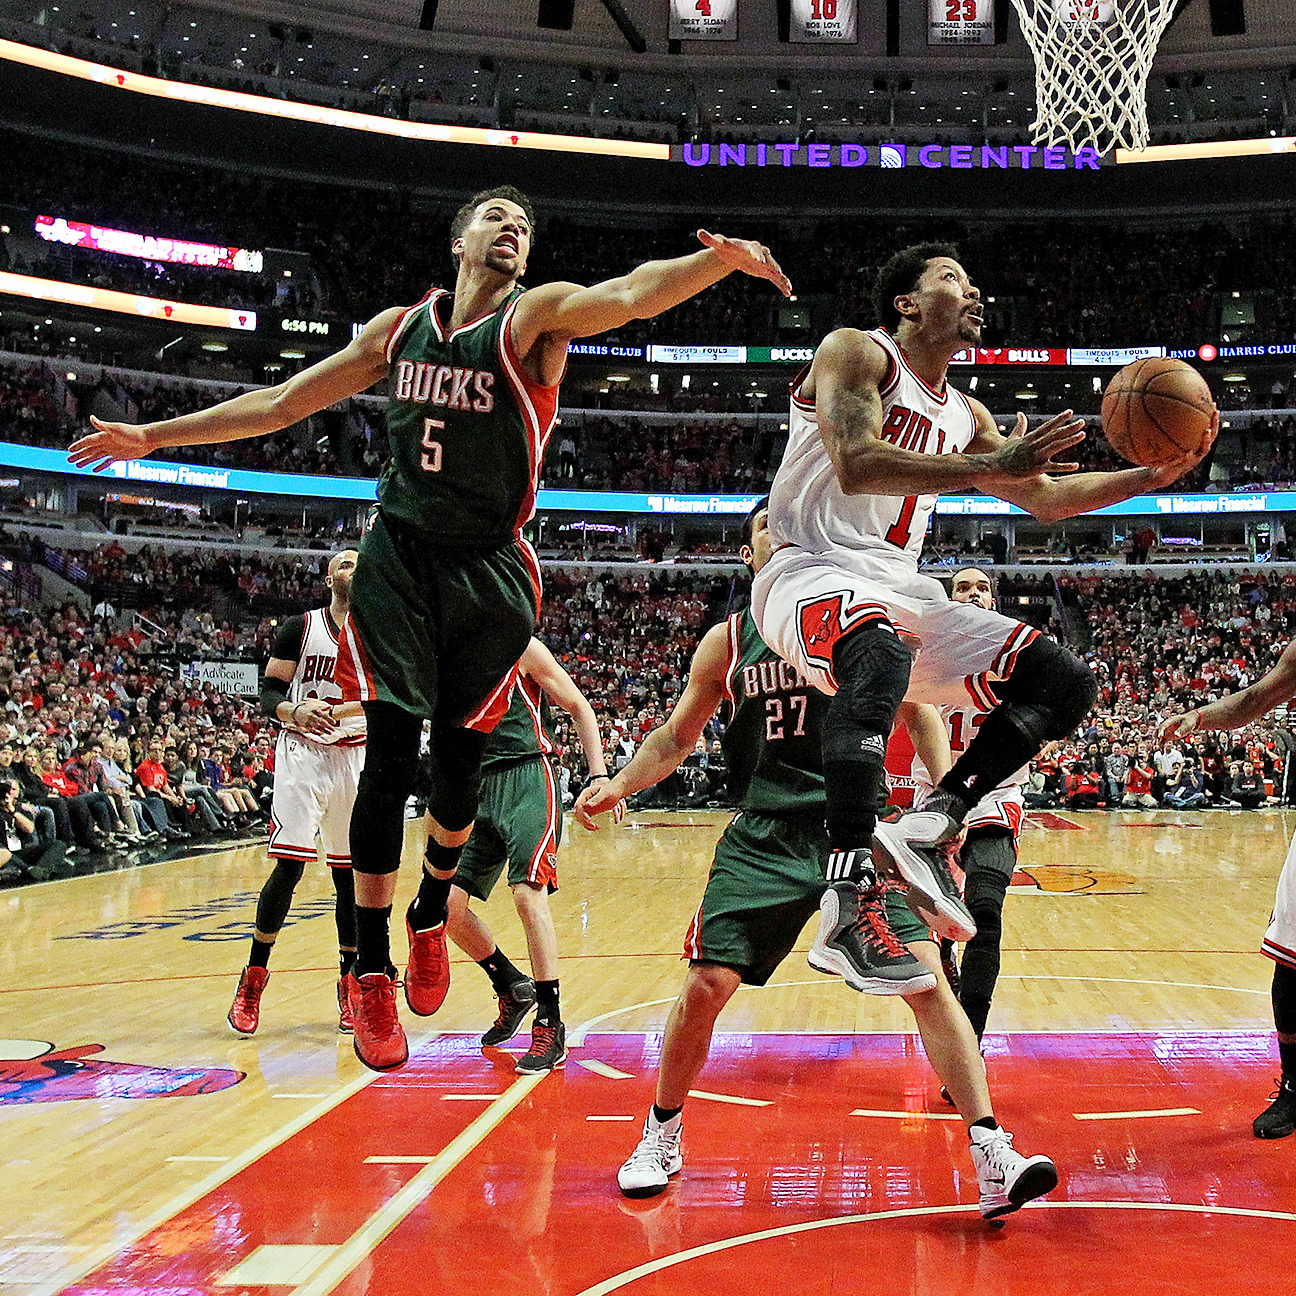 Blake Griffin, Los Angeles Clippers embrace 'underdog' role against San Antonio Spurs